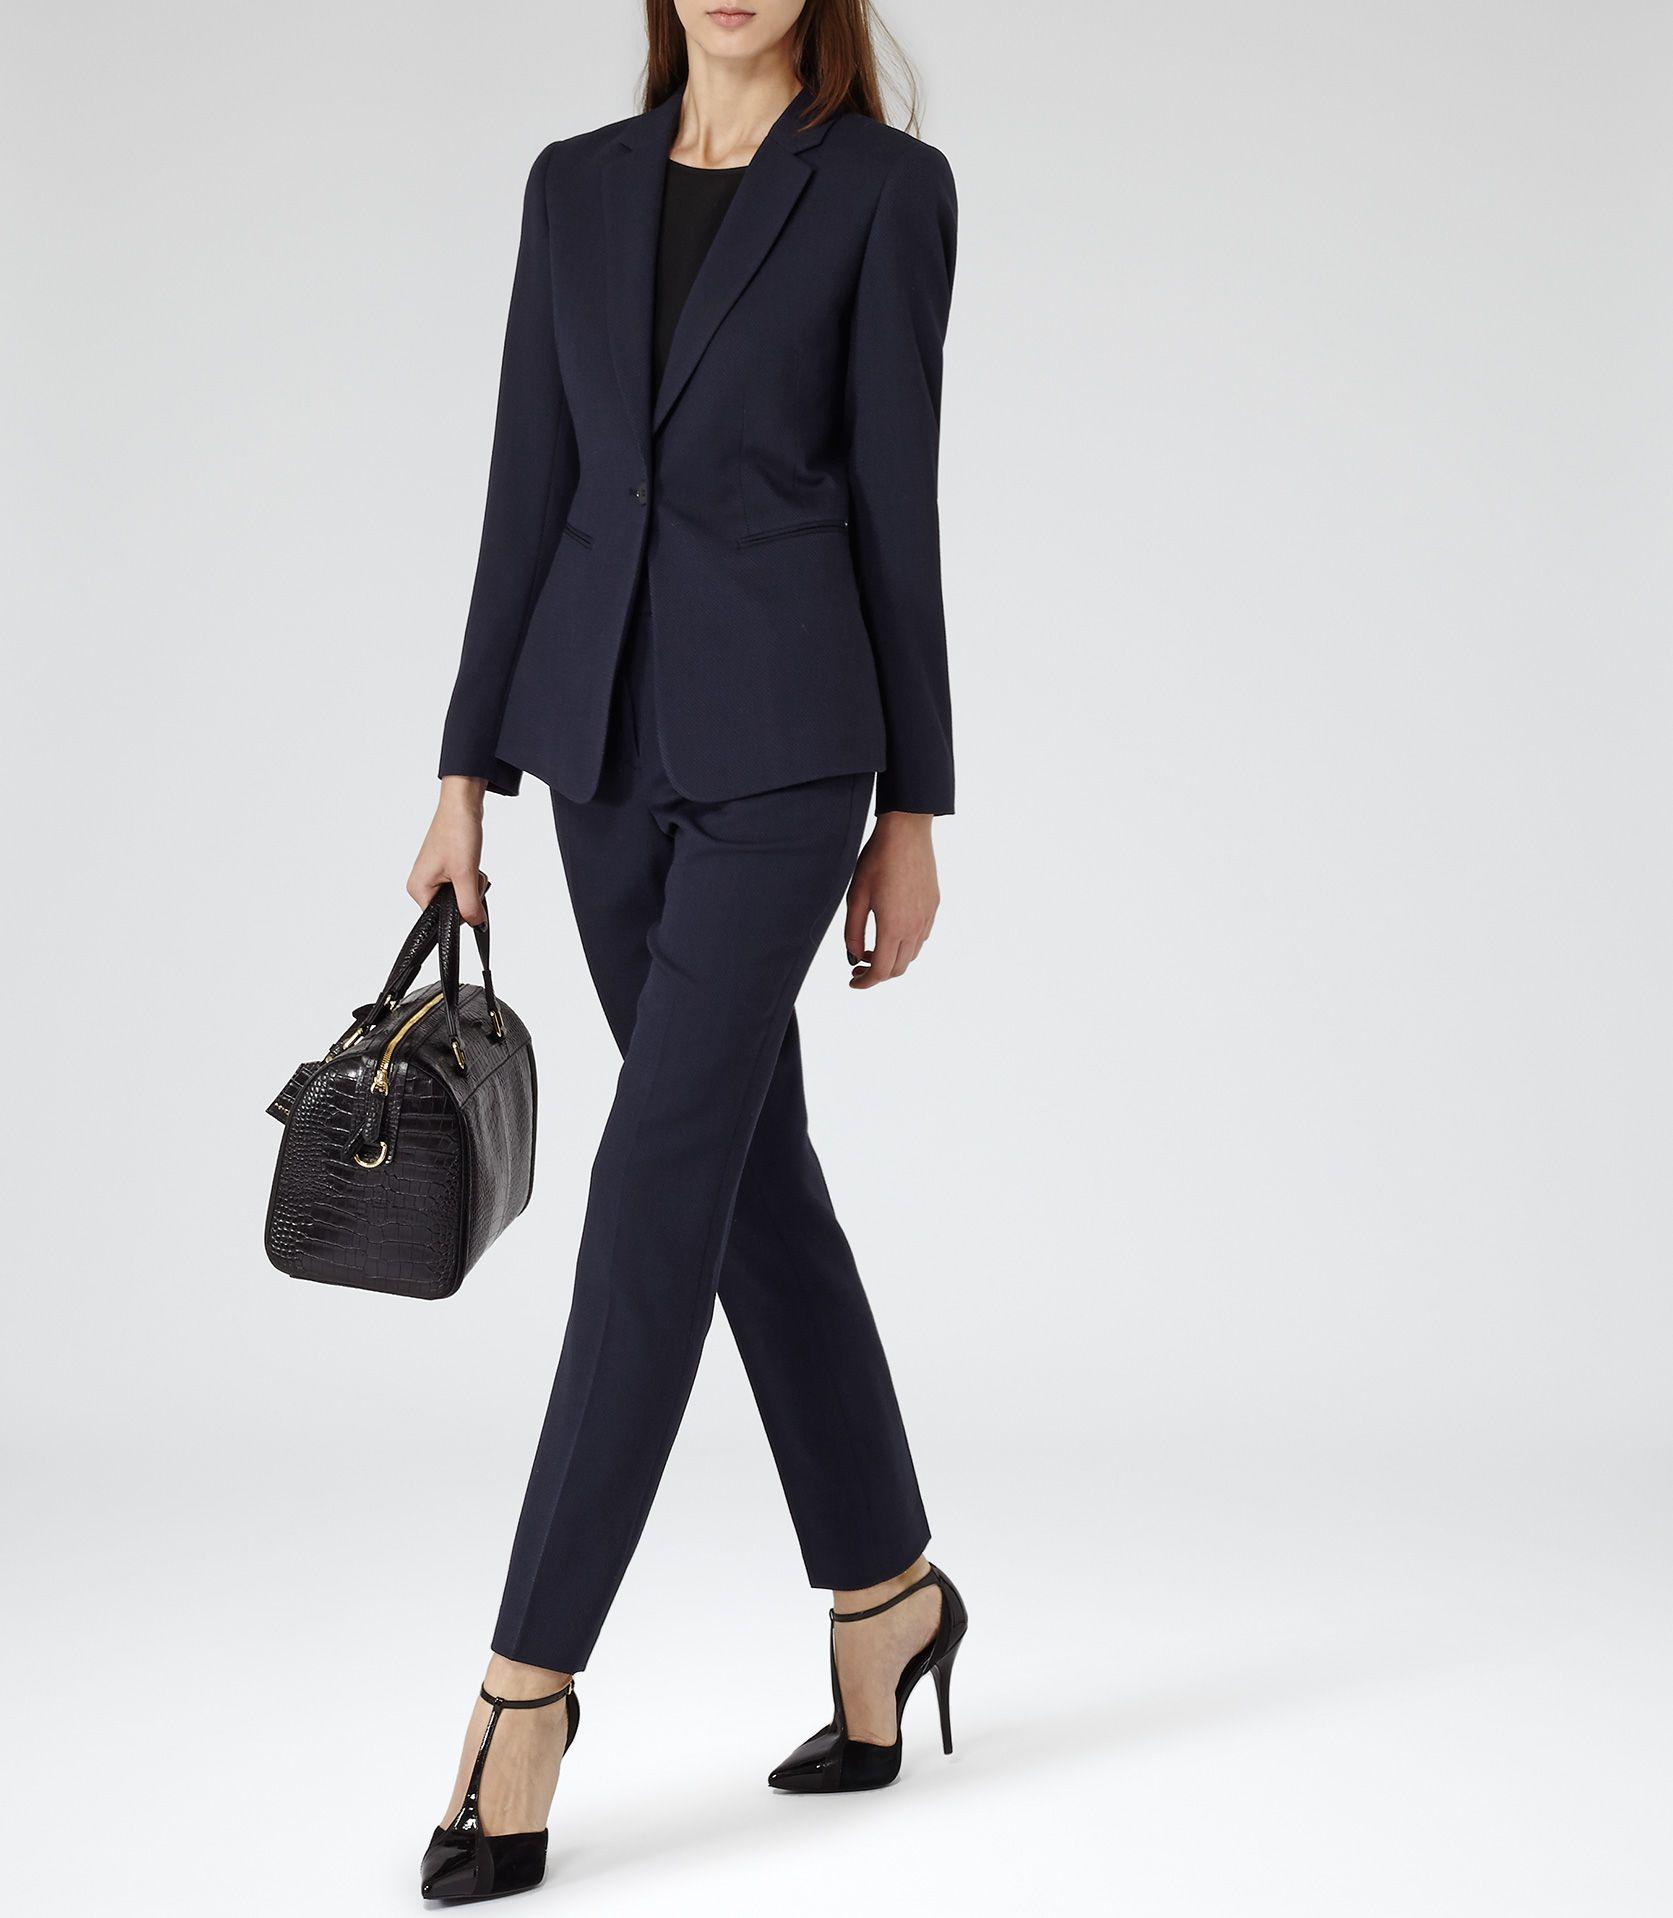 REISS Womens French Navy Slim-fit Tailored Jacket - Reiss Topaz ...